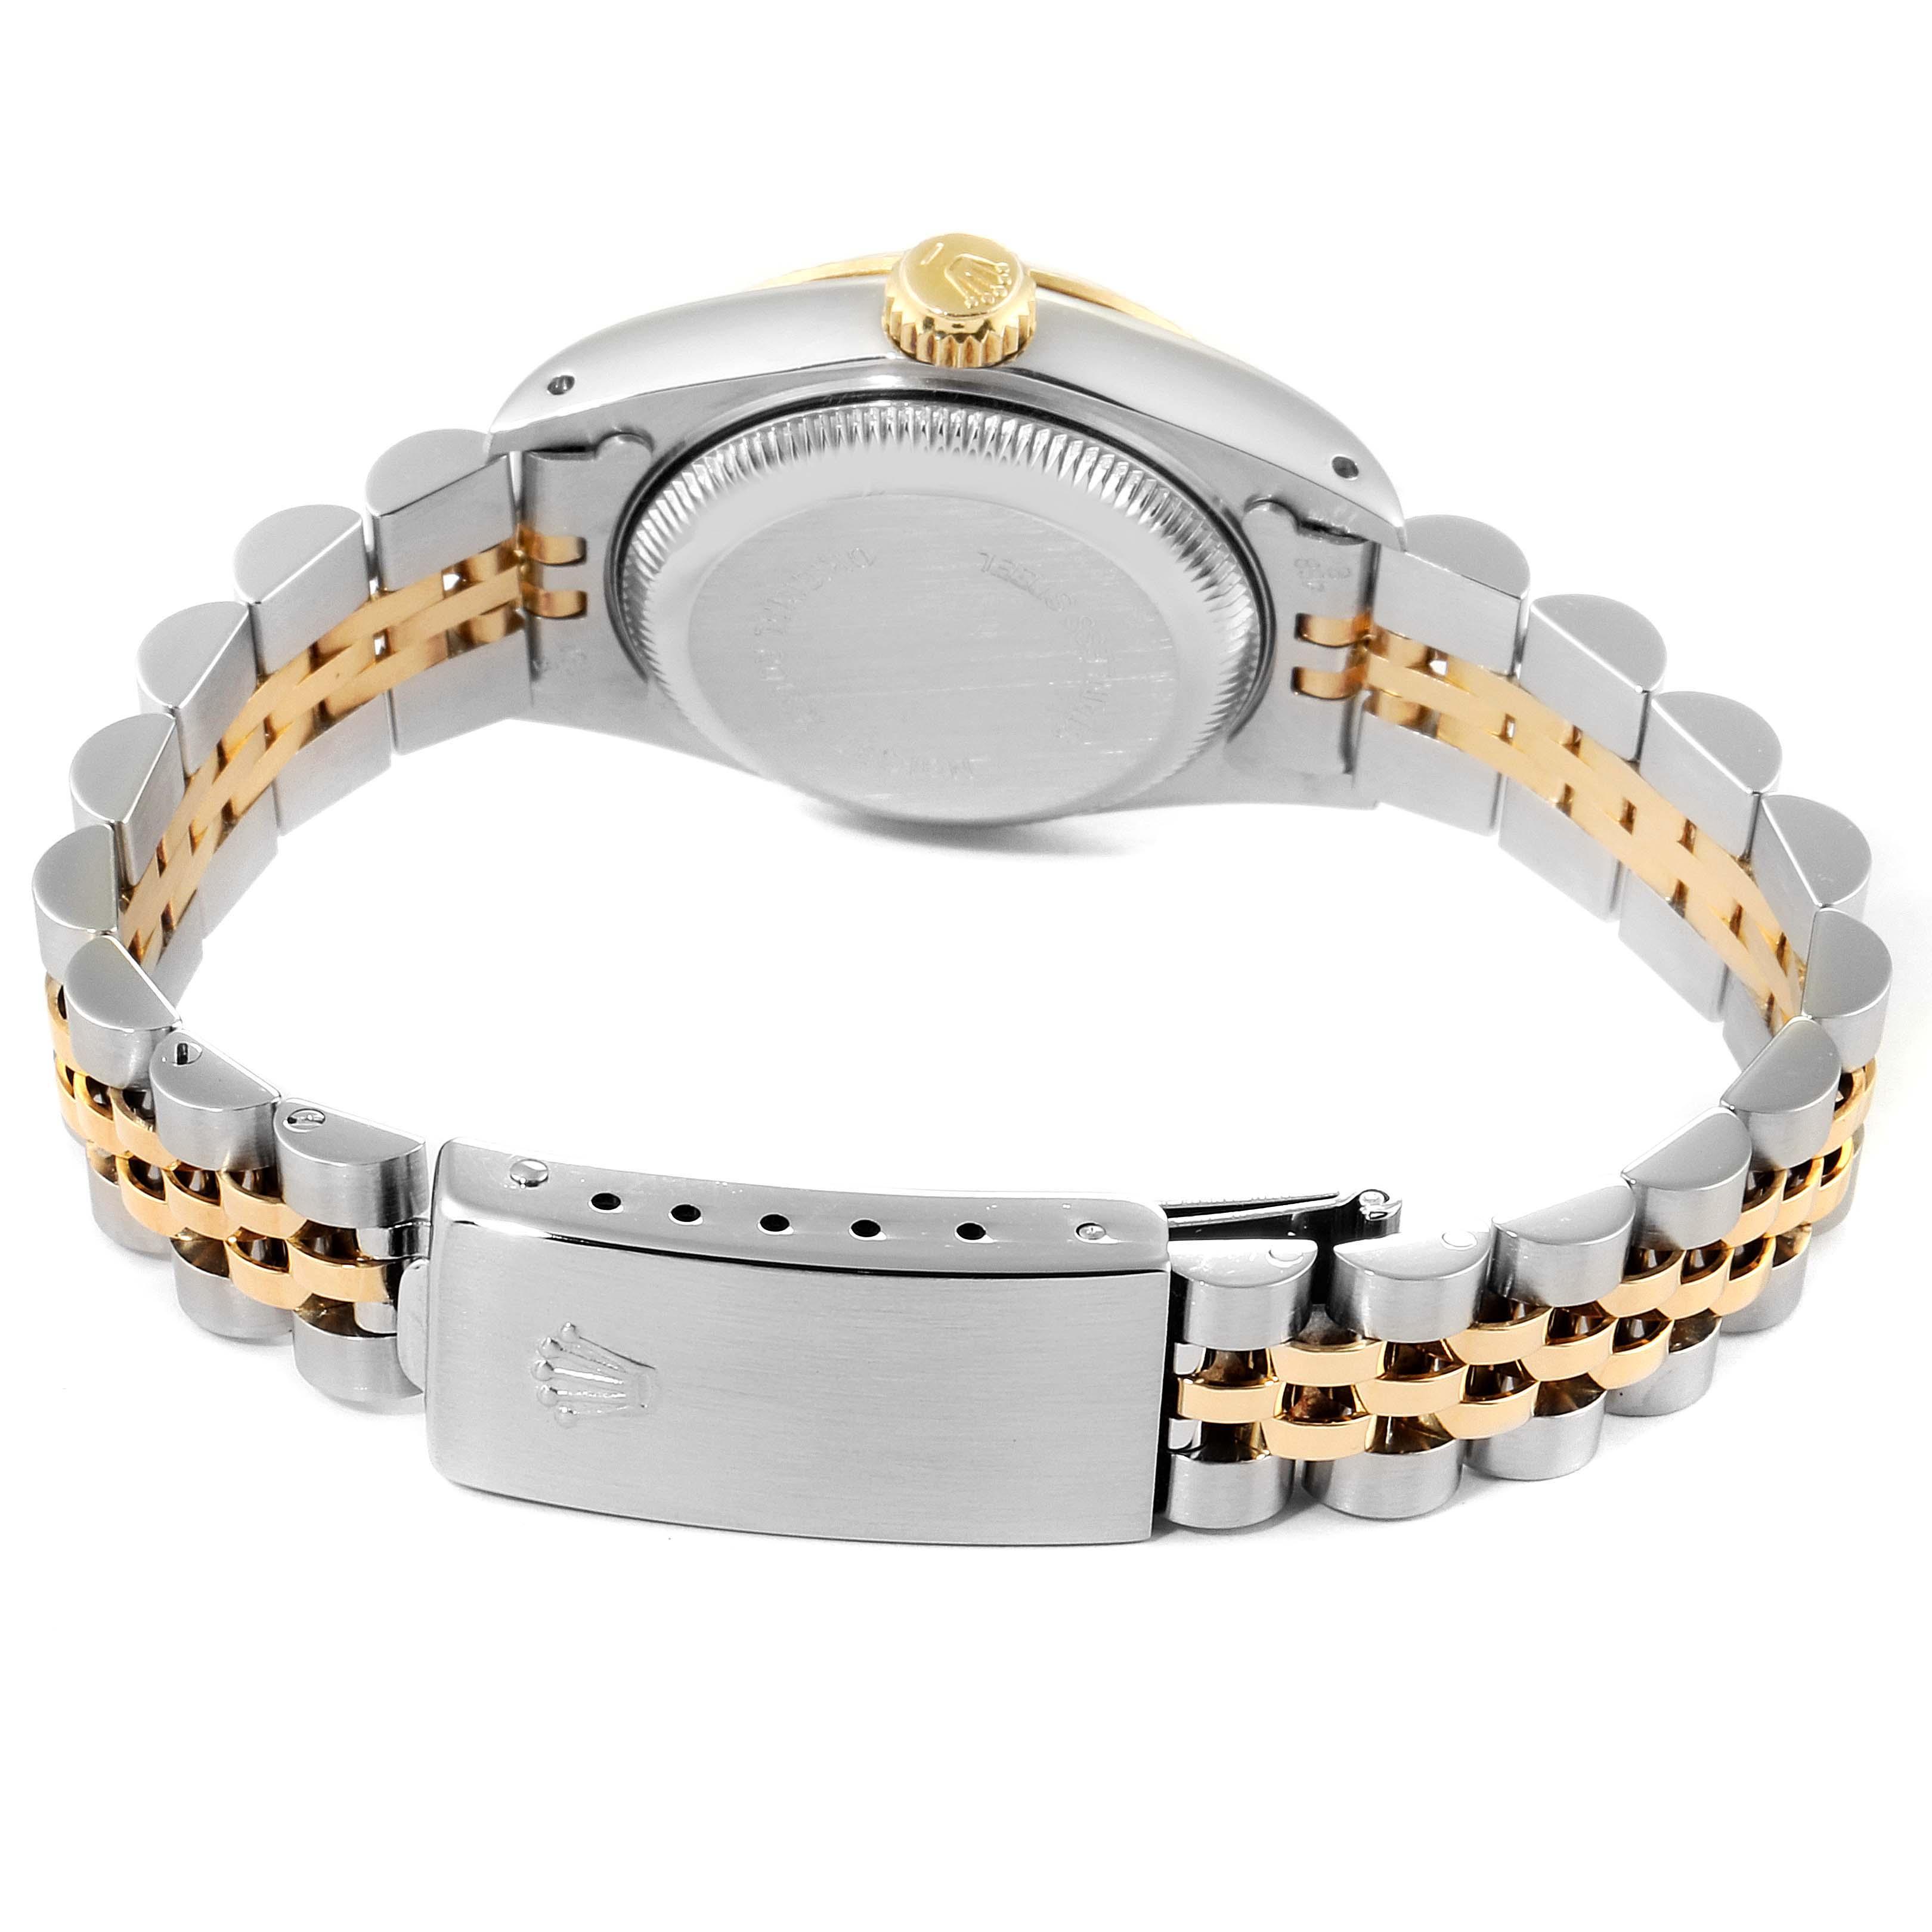 Rolex Datejust Steel Yellow Gold Fluted Bezel Ladies Watch 69173 Box Papers SwissWatchExpo